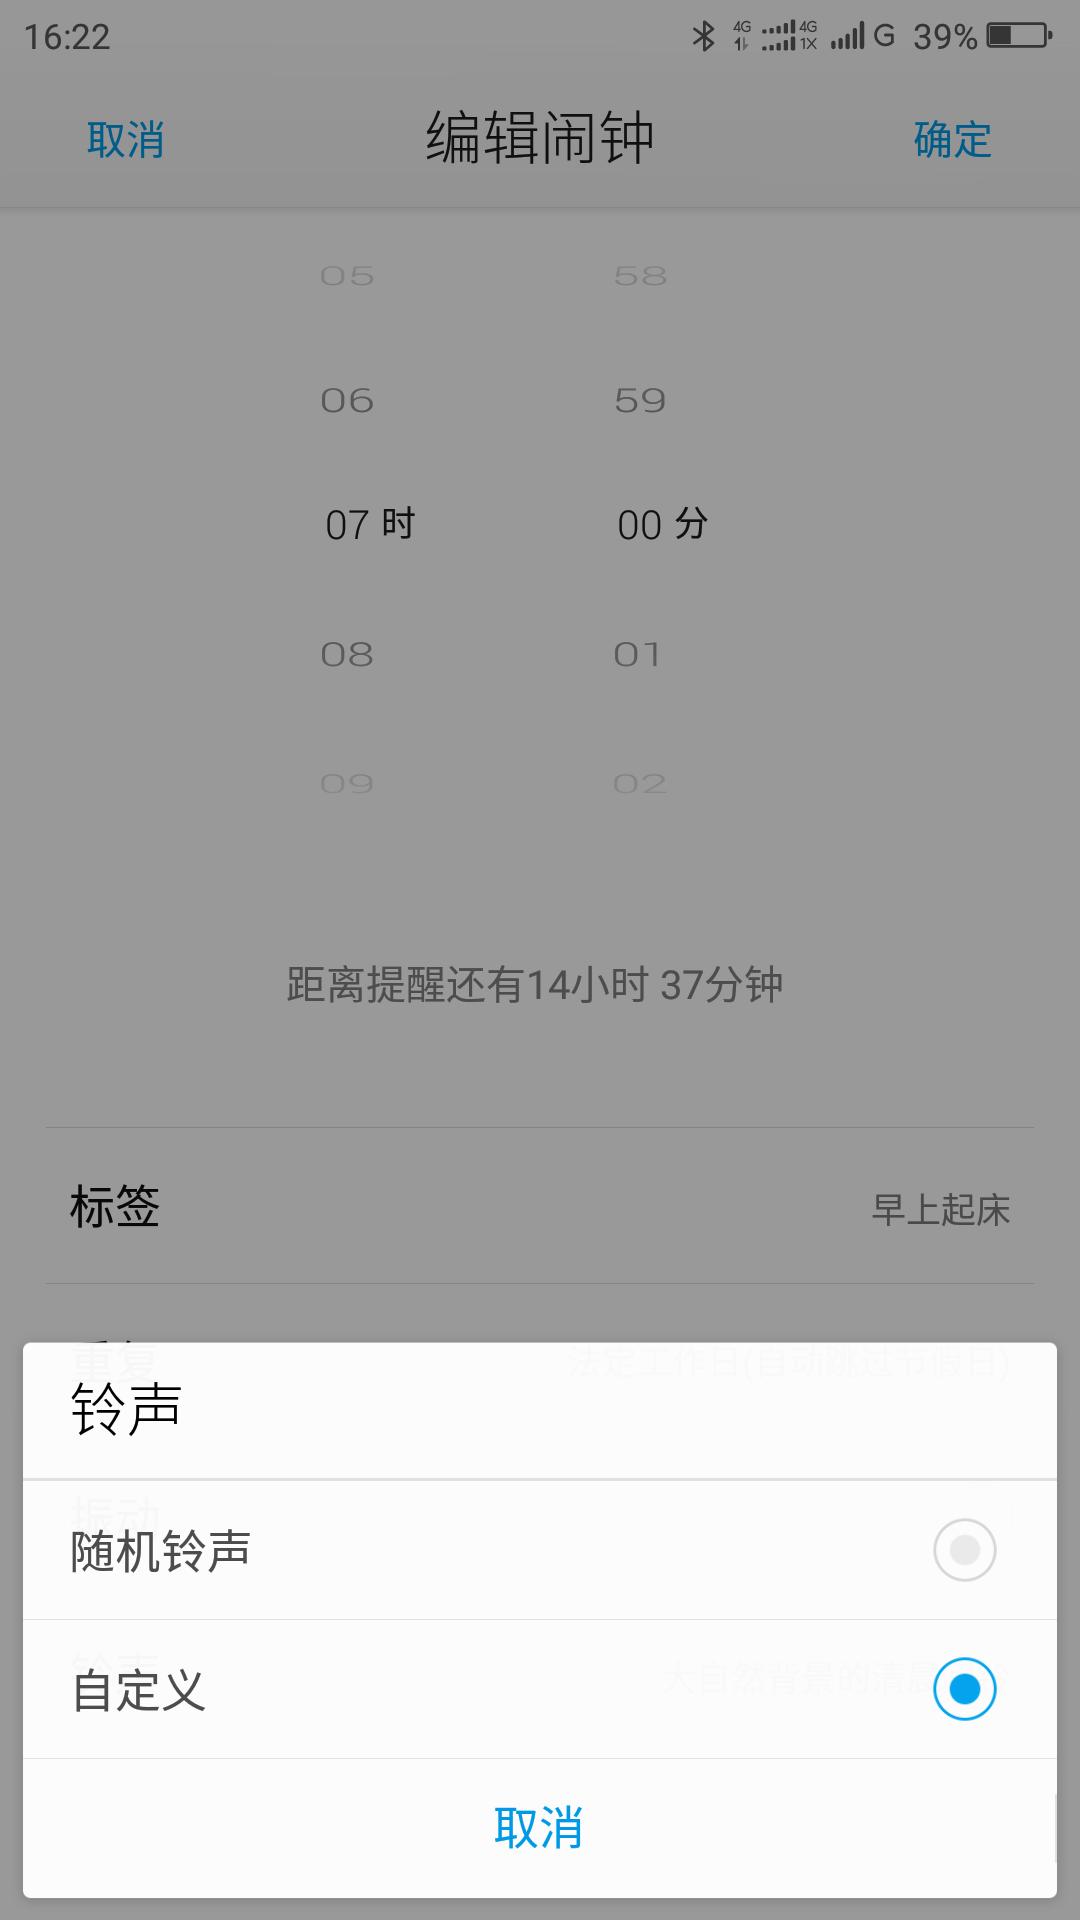 Screenshot_2016-03-20-16-22-54.png